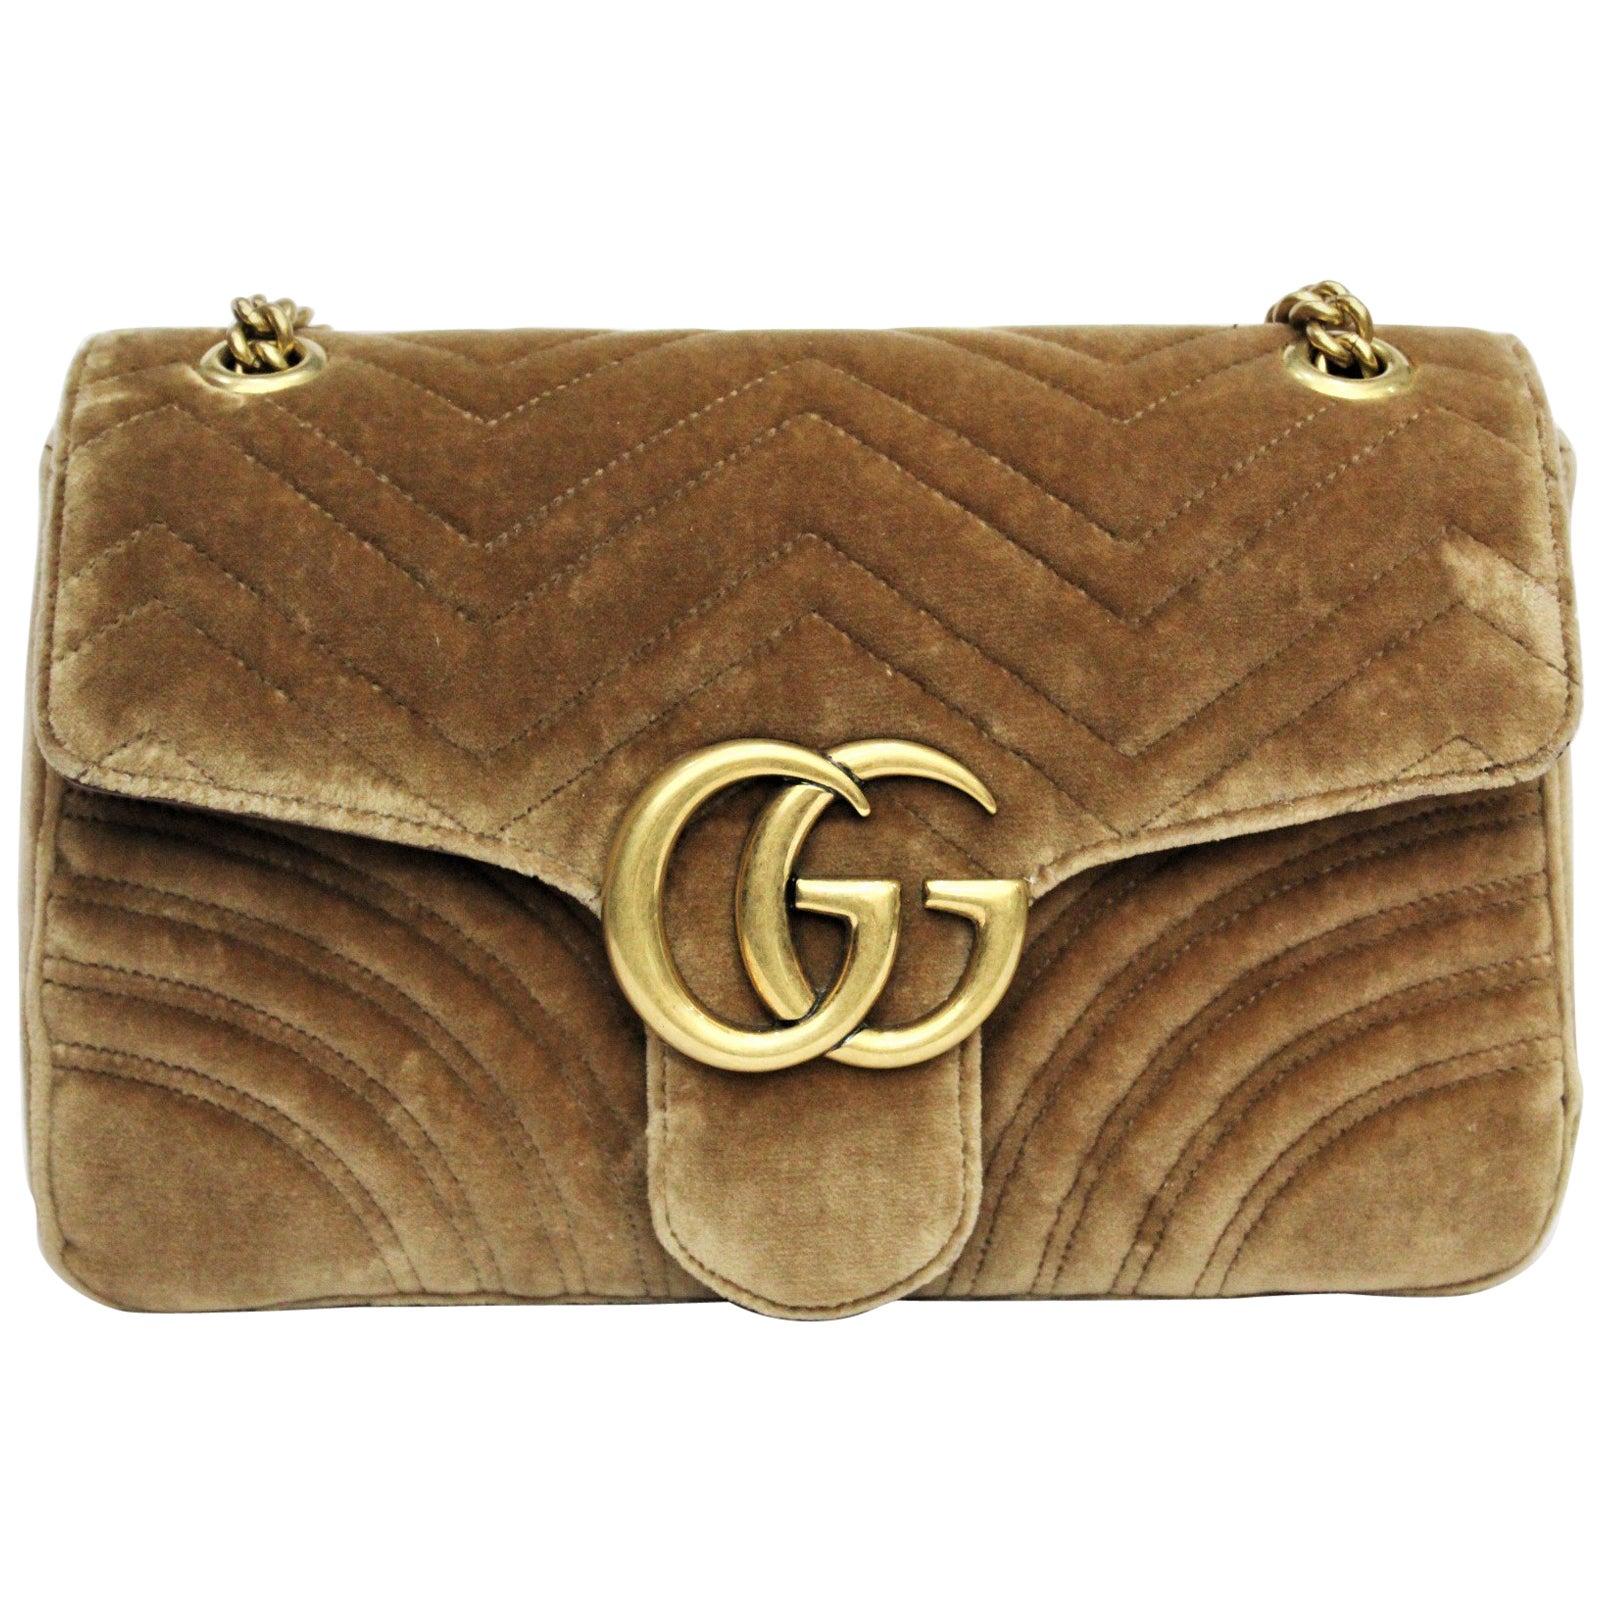 3690be913dc Gucci Brown Marmont Velvet Bag at 1stdibs